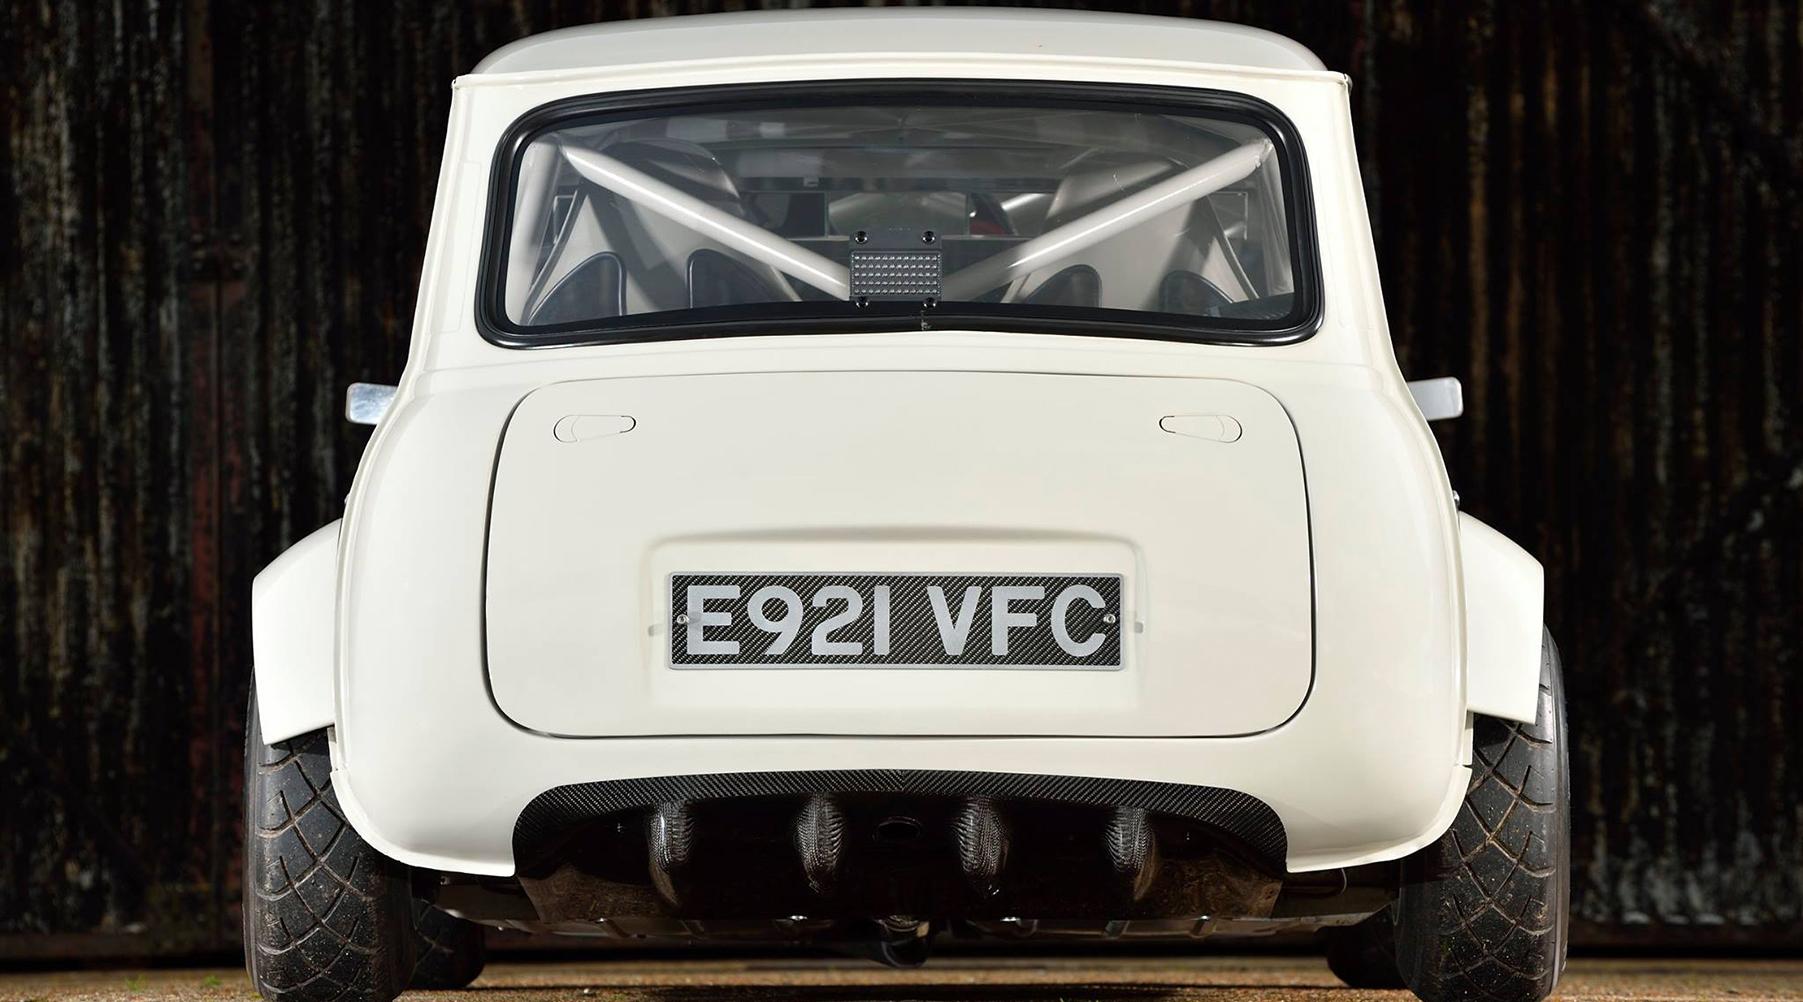 Alan Carruthers' Amazing bike engined mini